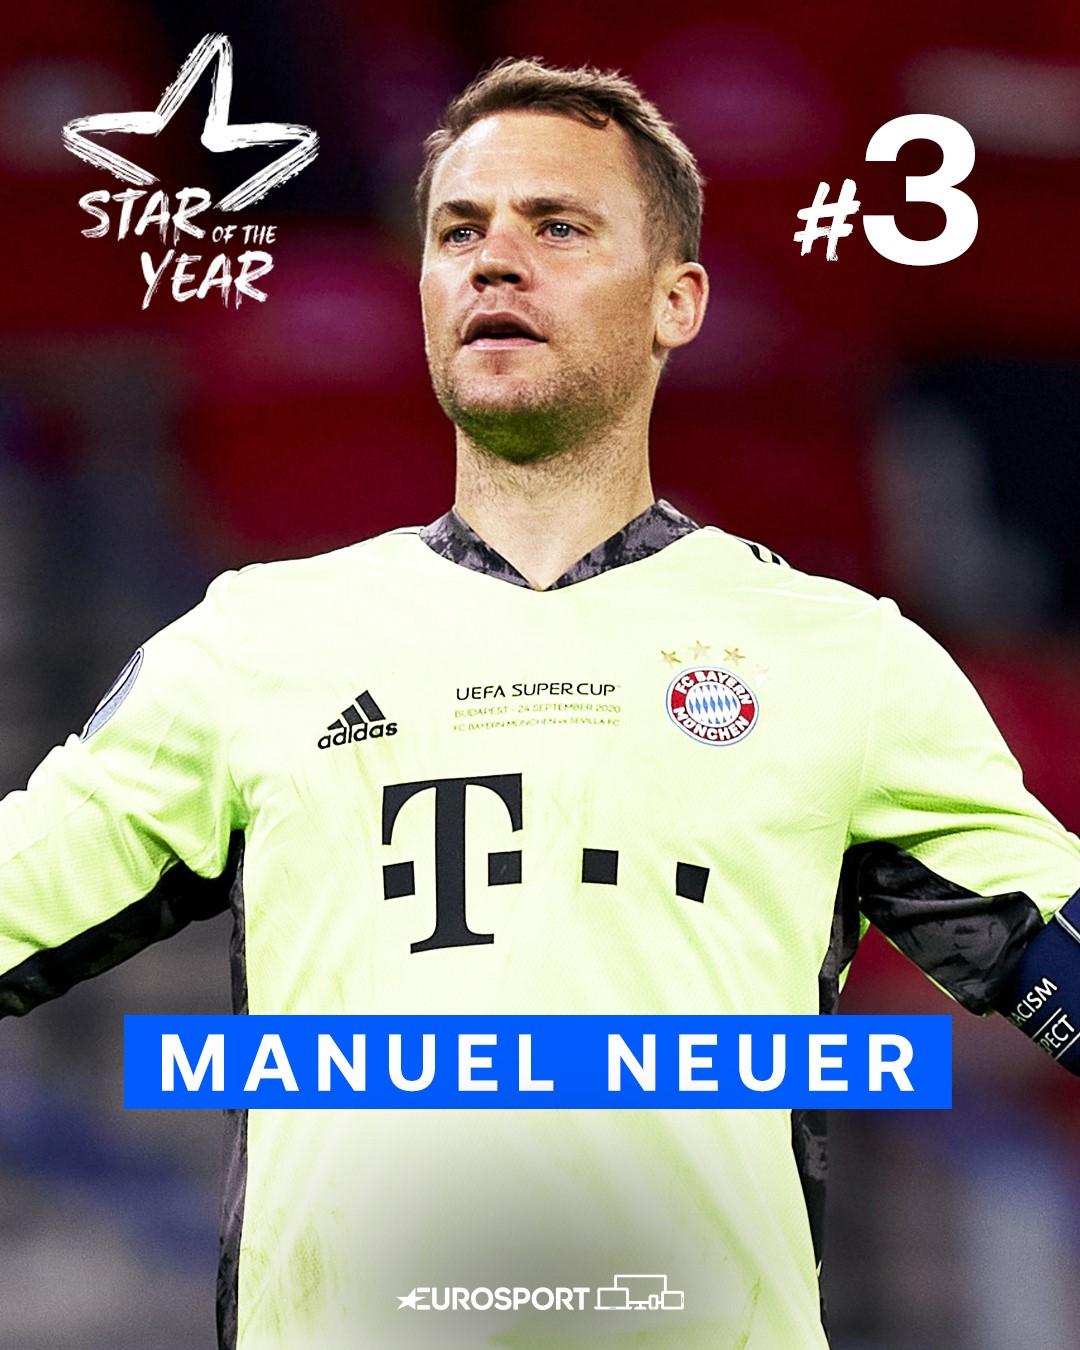 https://i.eurosport.com/2020/12/14/2955586.jpg